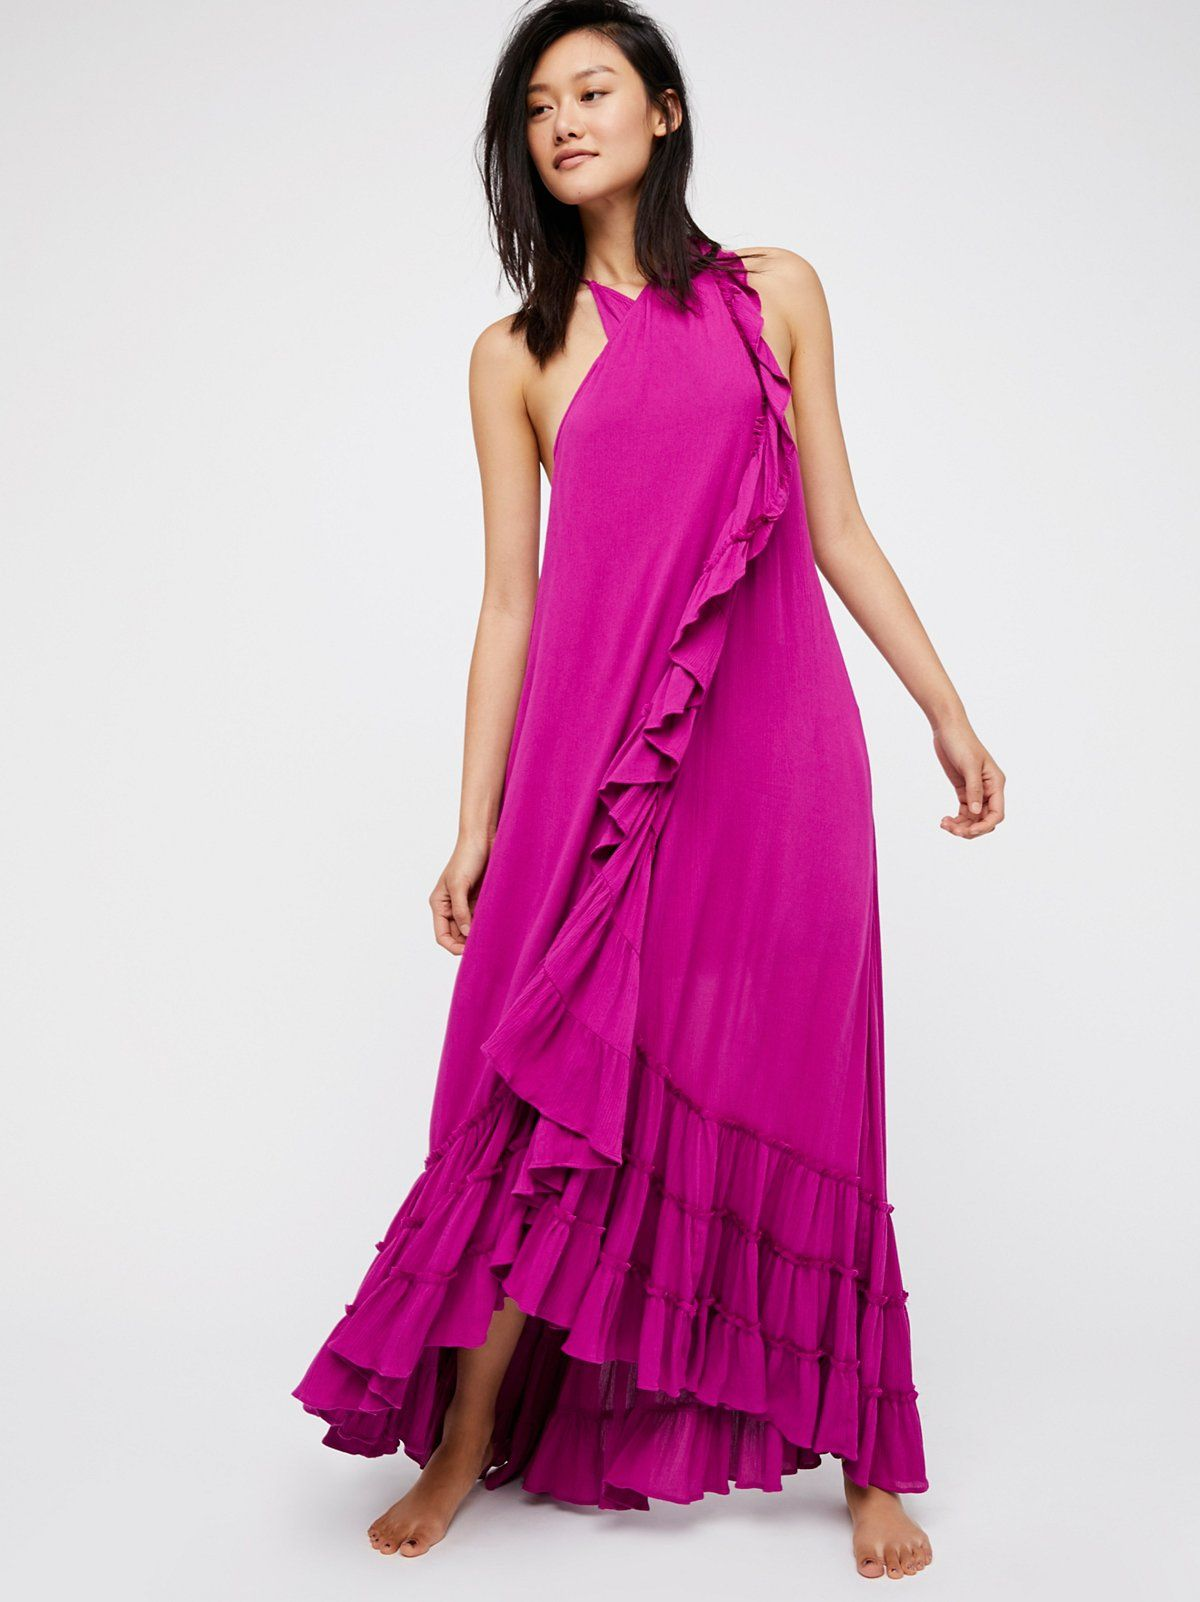 Wrap Around Maxi Dress Maxi Dress Maxi Wrap Dress White Maxi Dress Boho [ 1602 x 1200 Pixel ]